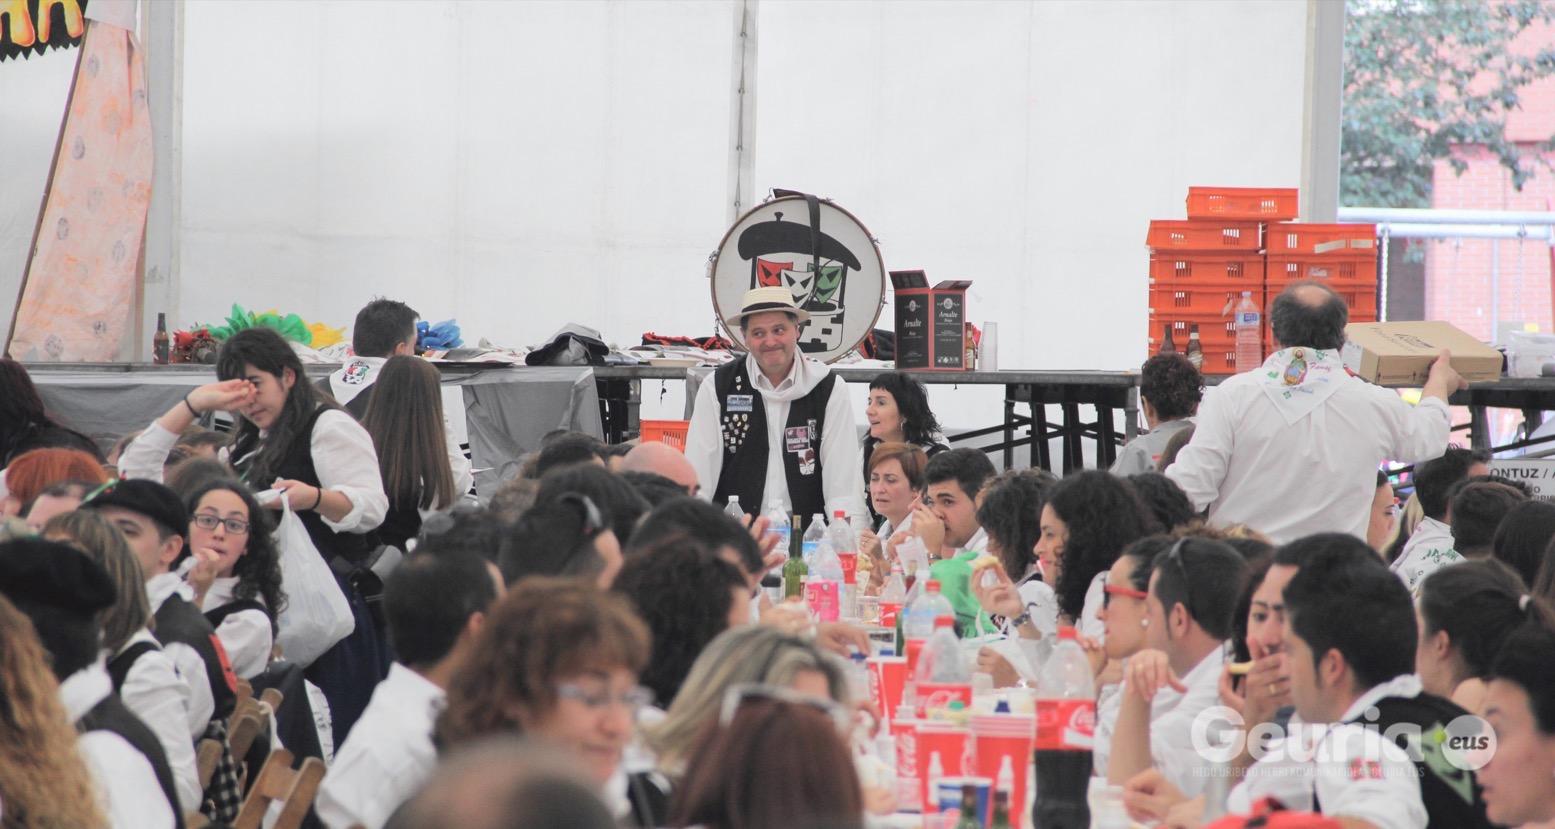 basauri_san_fausto_2015_comida_cuadrilla_31